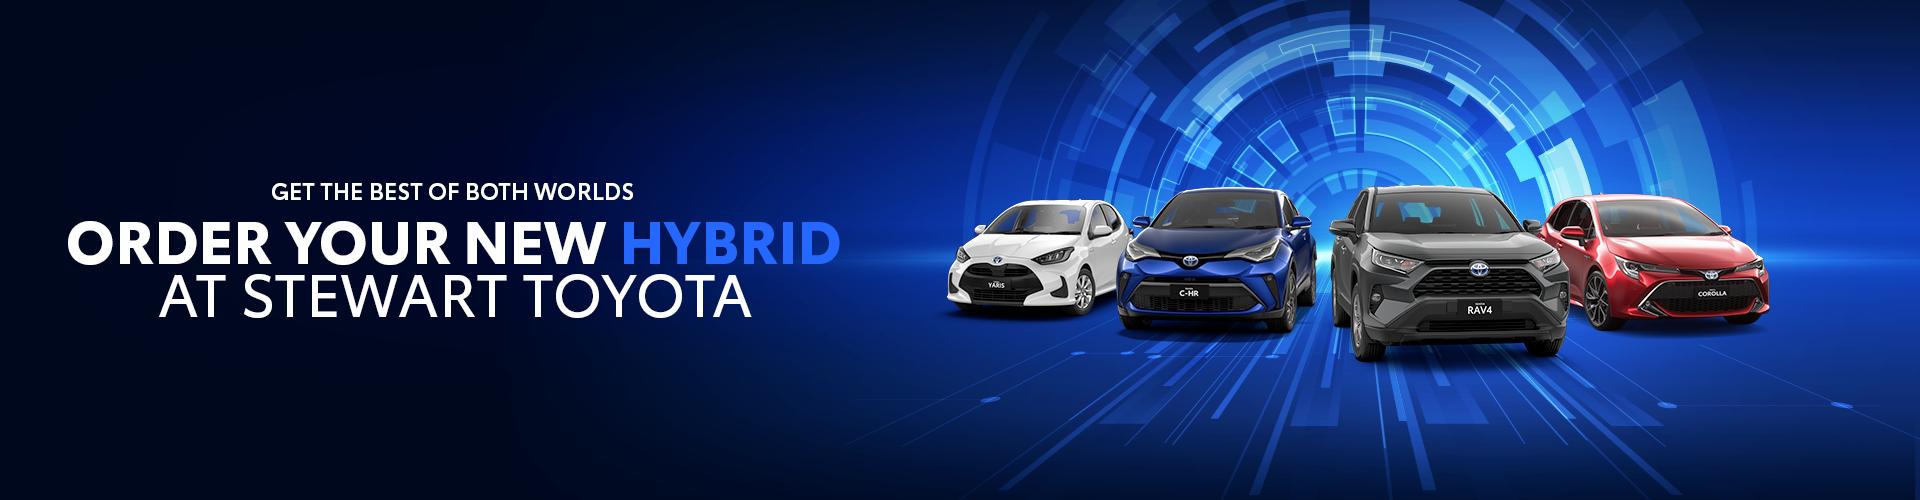 Order Your New Hybrid